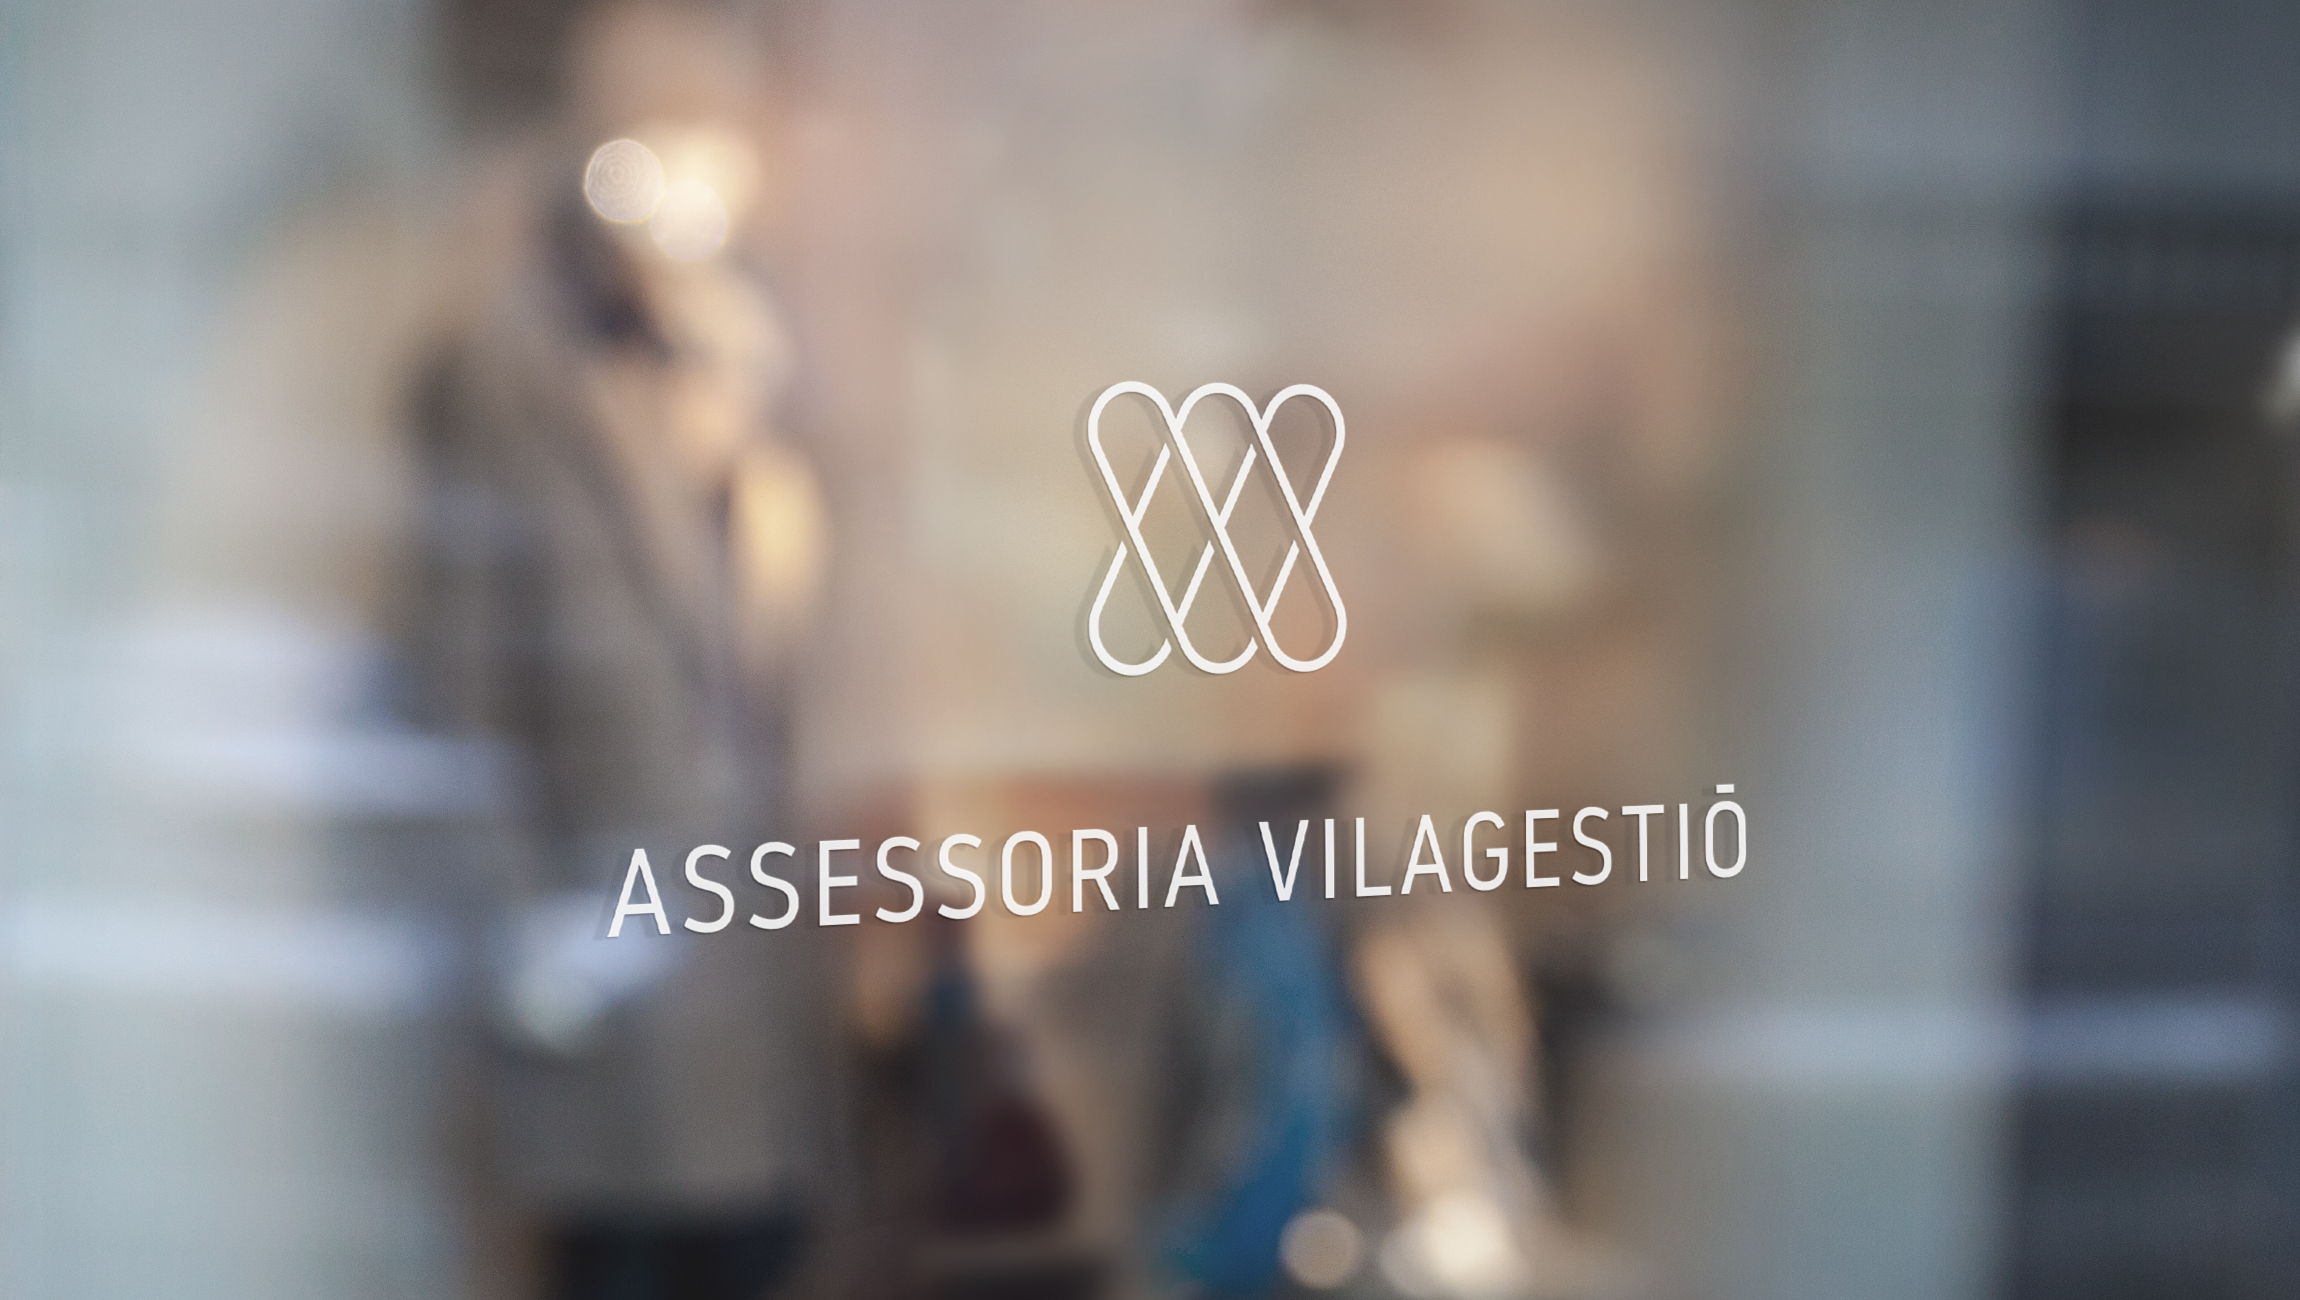 vilagestio_9-cristal